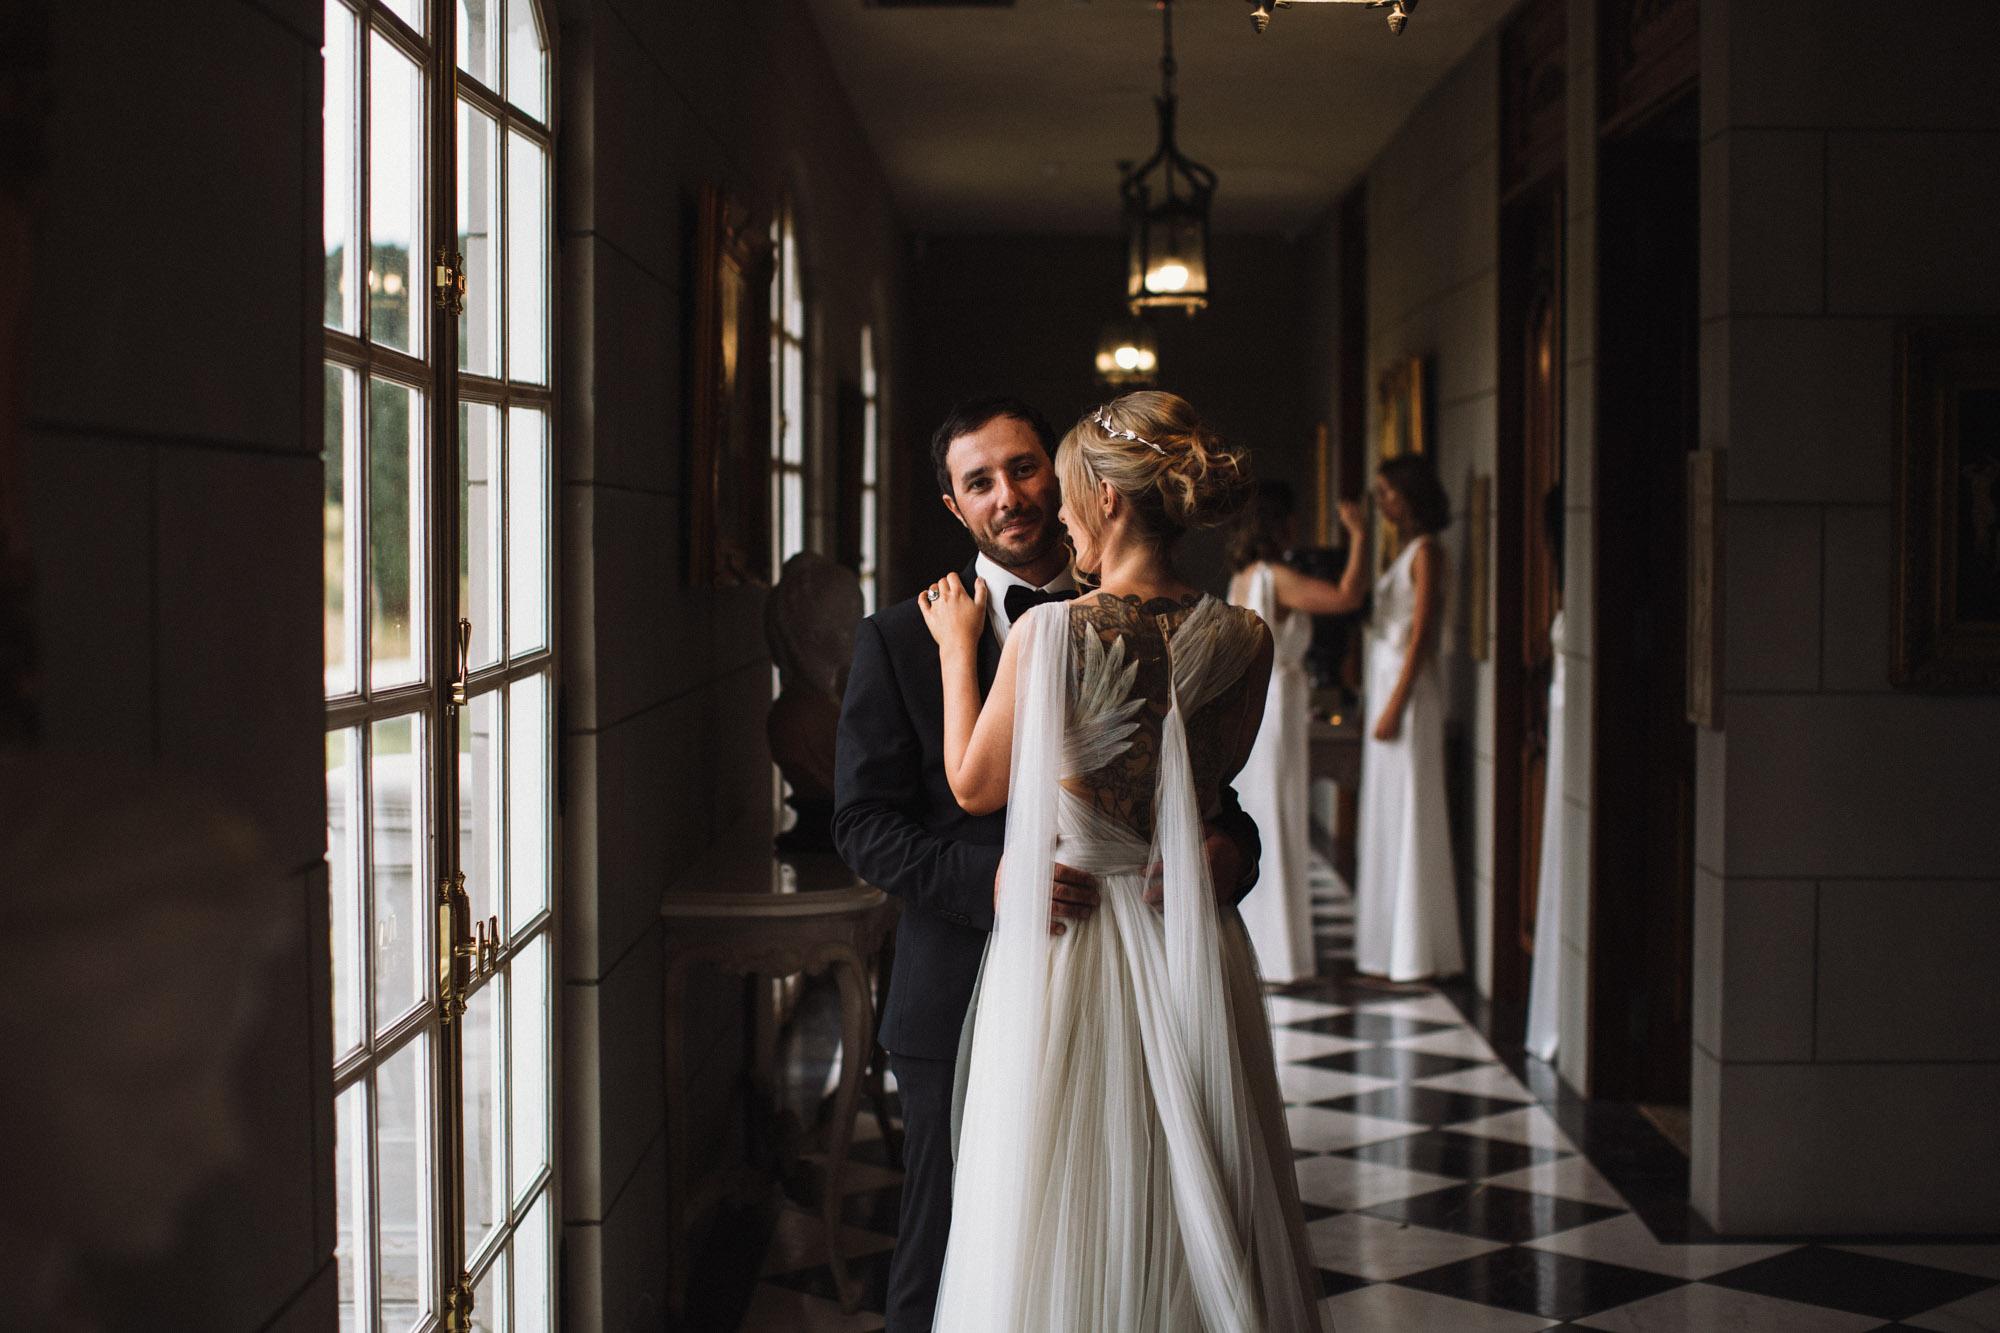 Campbell Point House Wedding HJ + Dean Raphael Weddings-109.jpg